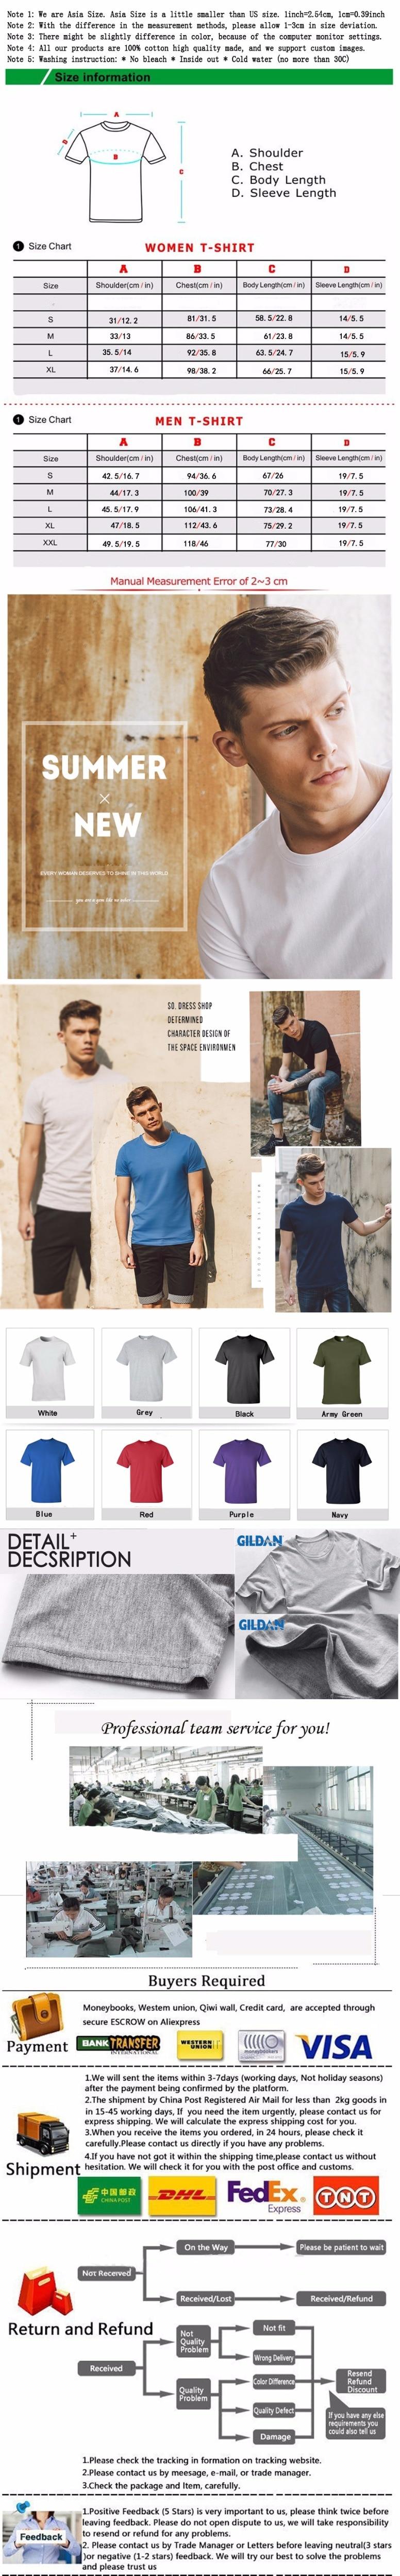 2018 Hot Sale 100% Cotton DCDS DJ Pug Rainbow Dog Shades and Headphones T-Shirt Summer Style Tee Shirt